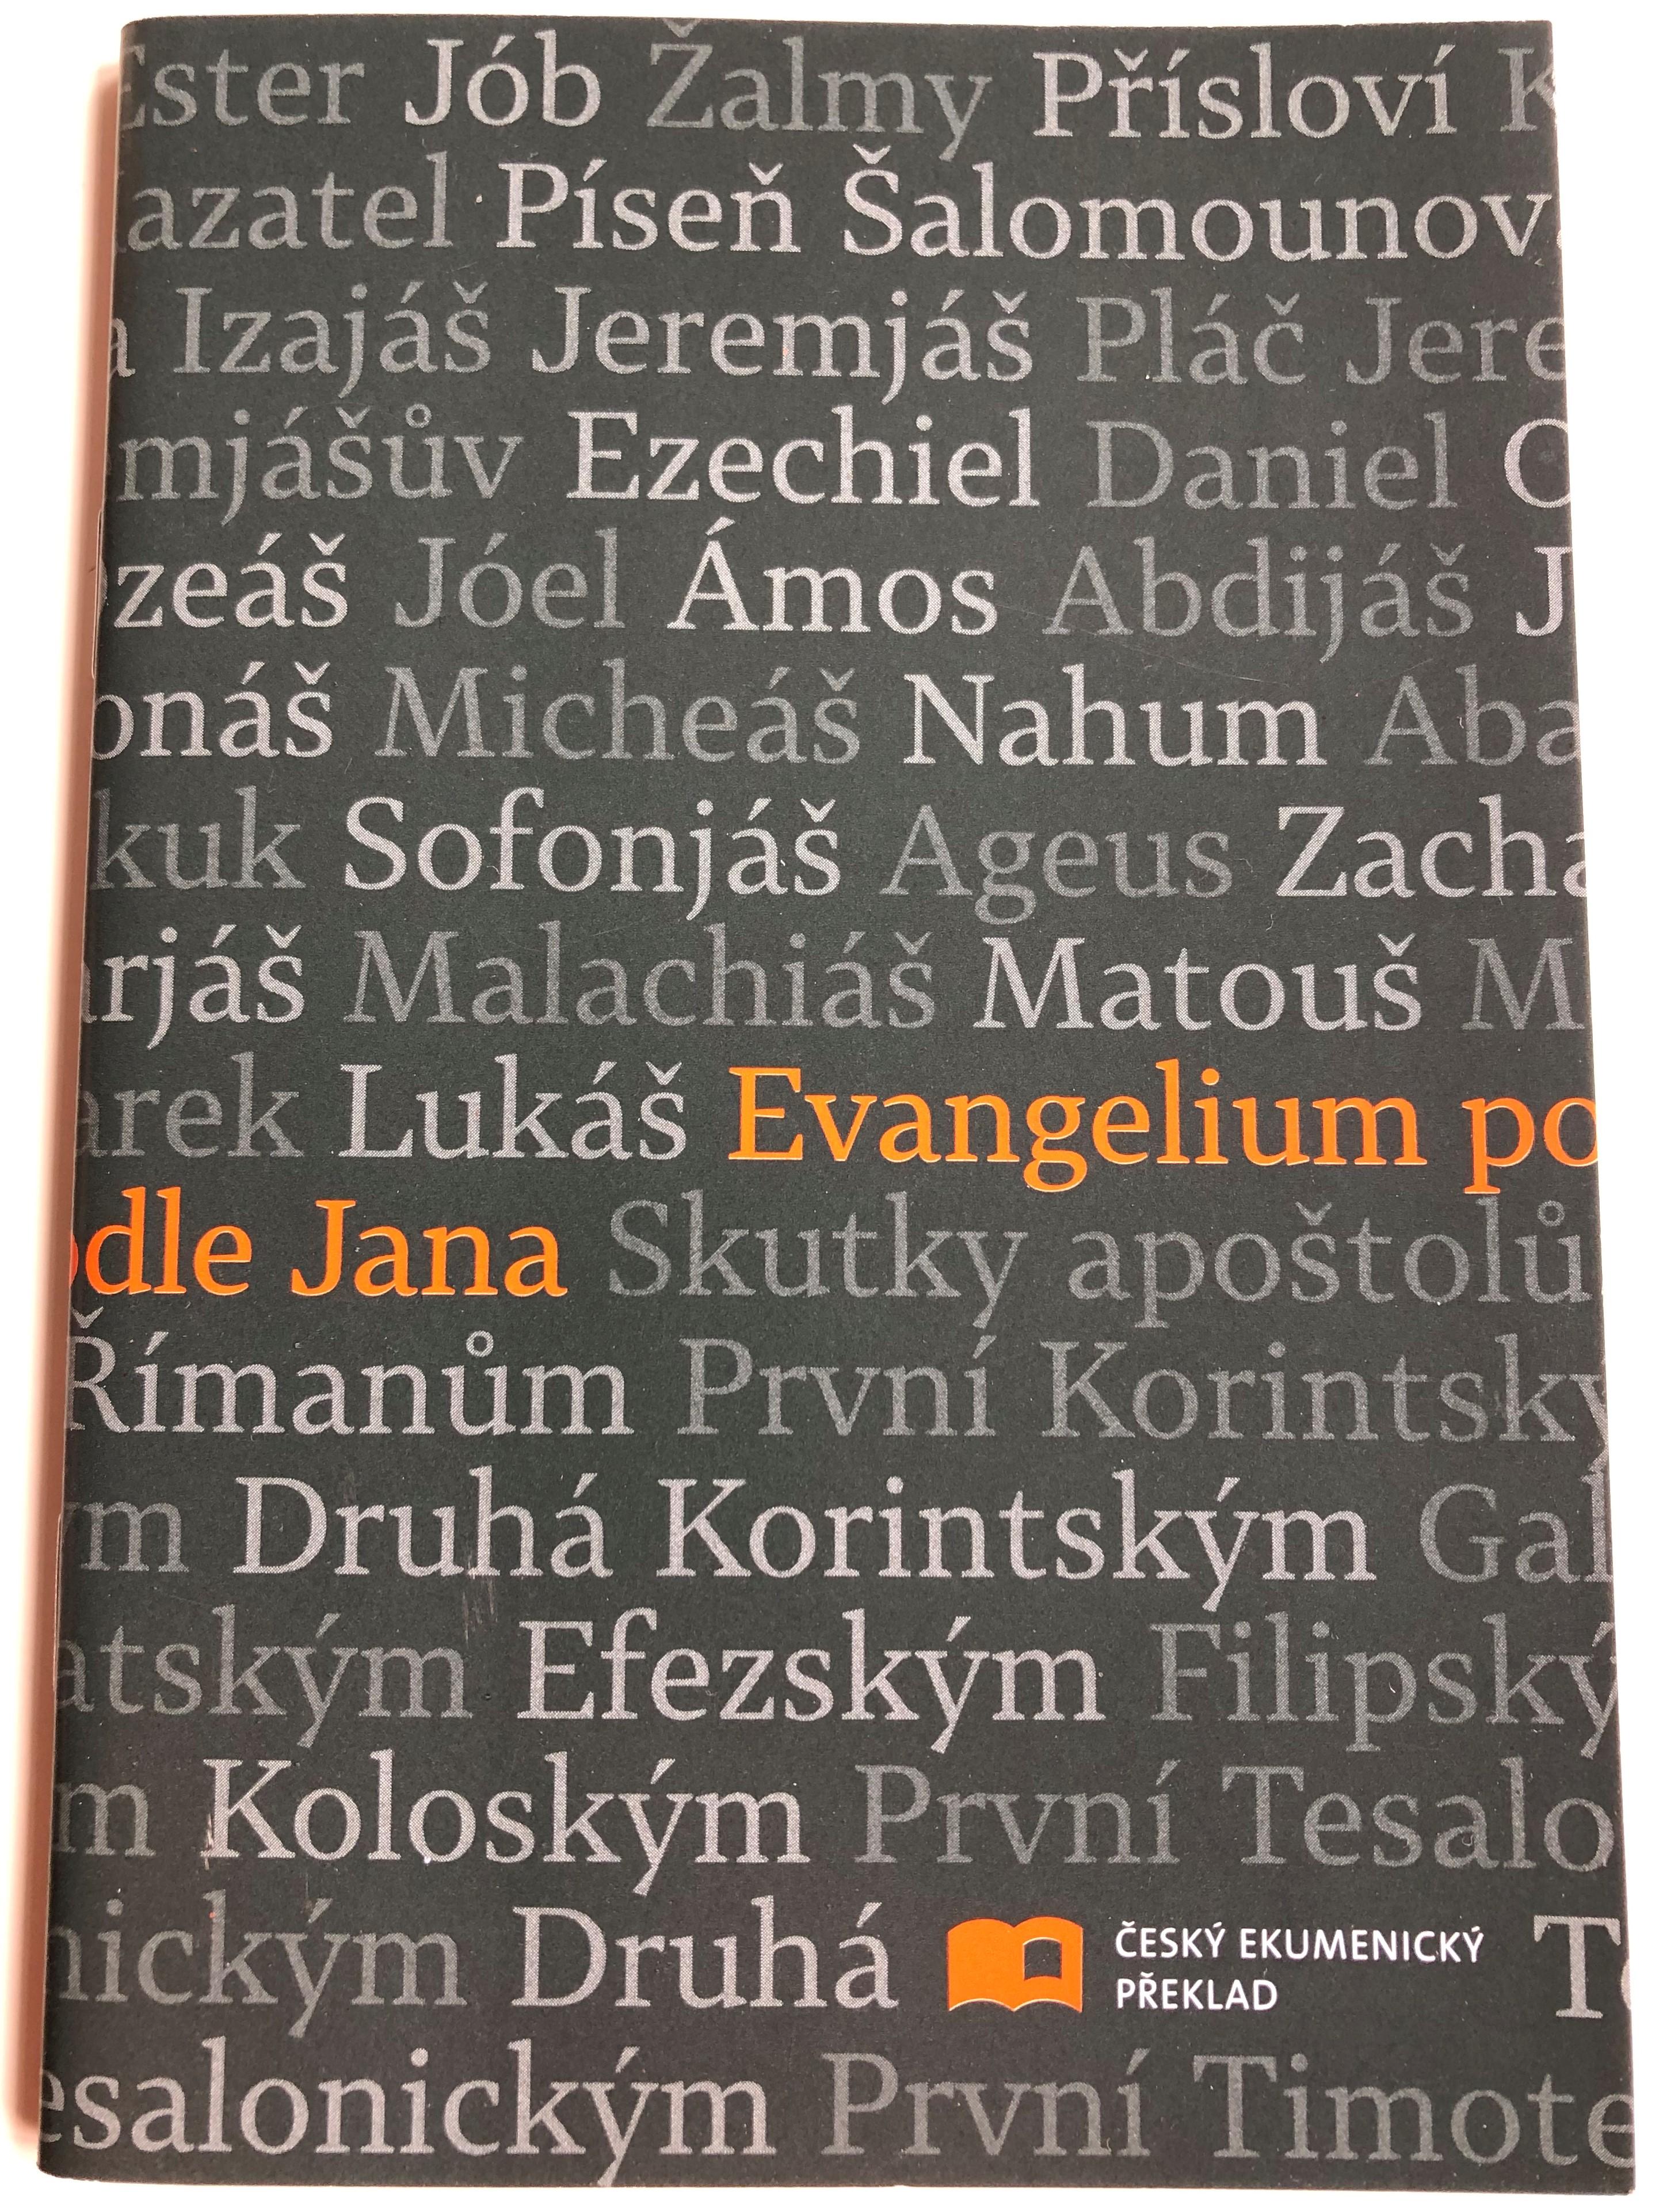 evangelium-podle-jana-czech-language-gospel-according-to-john-1.jpg